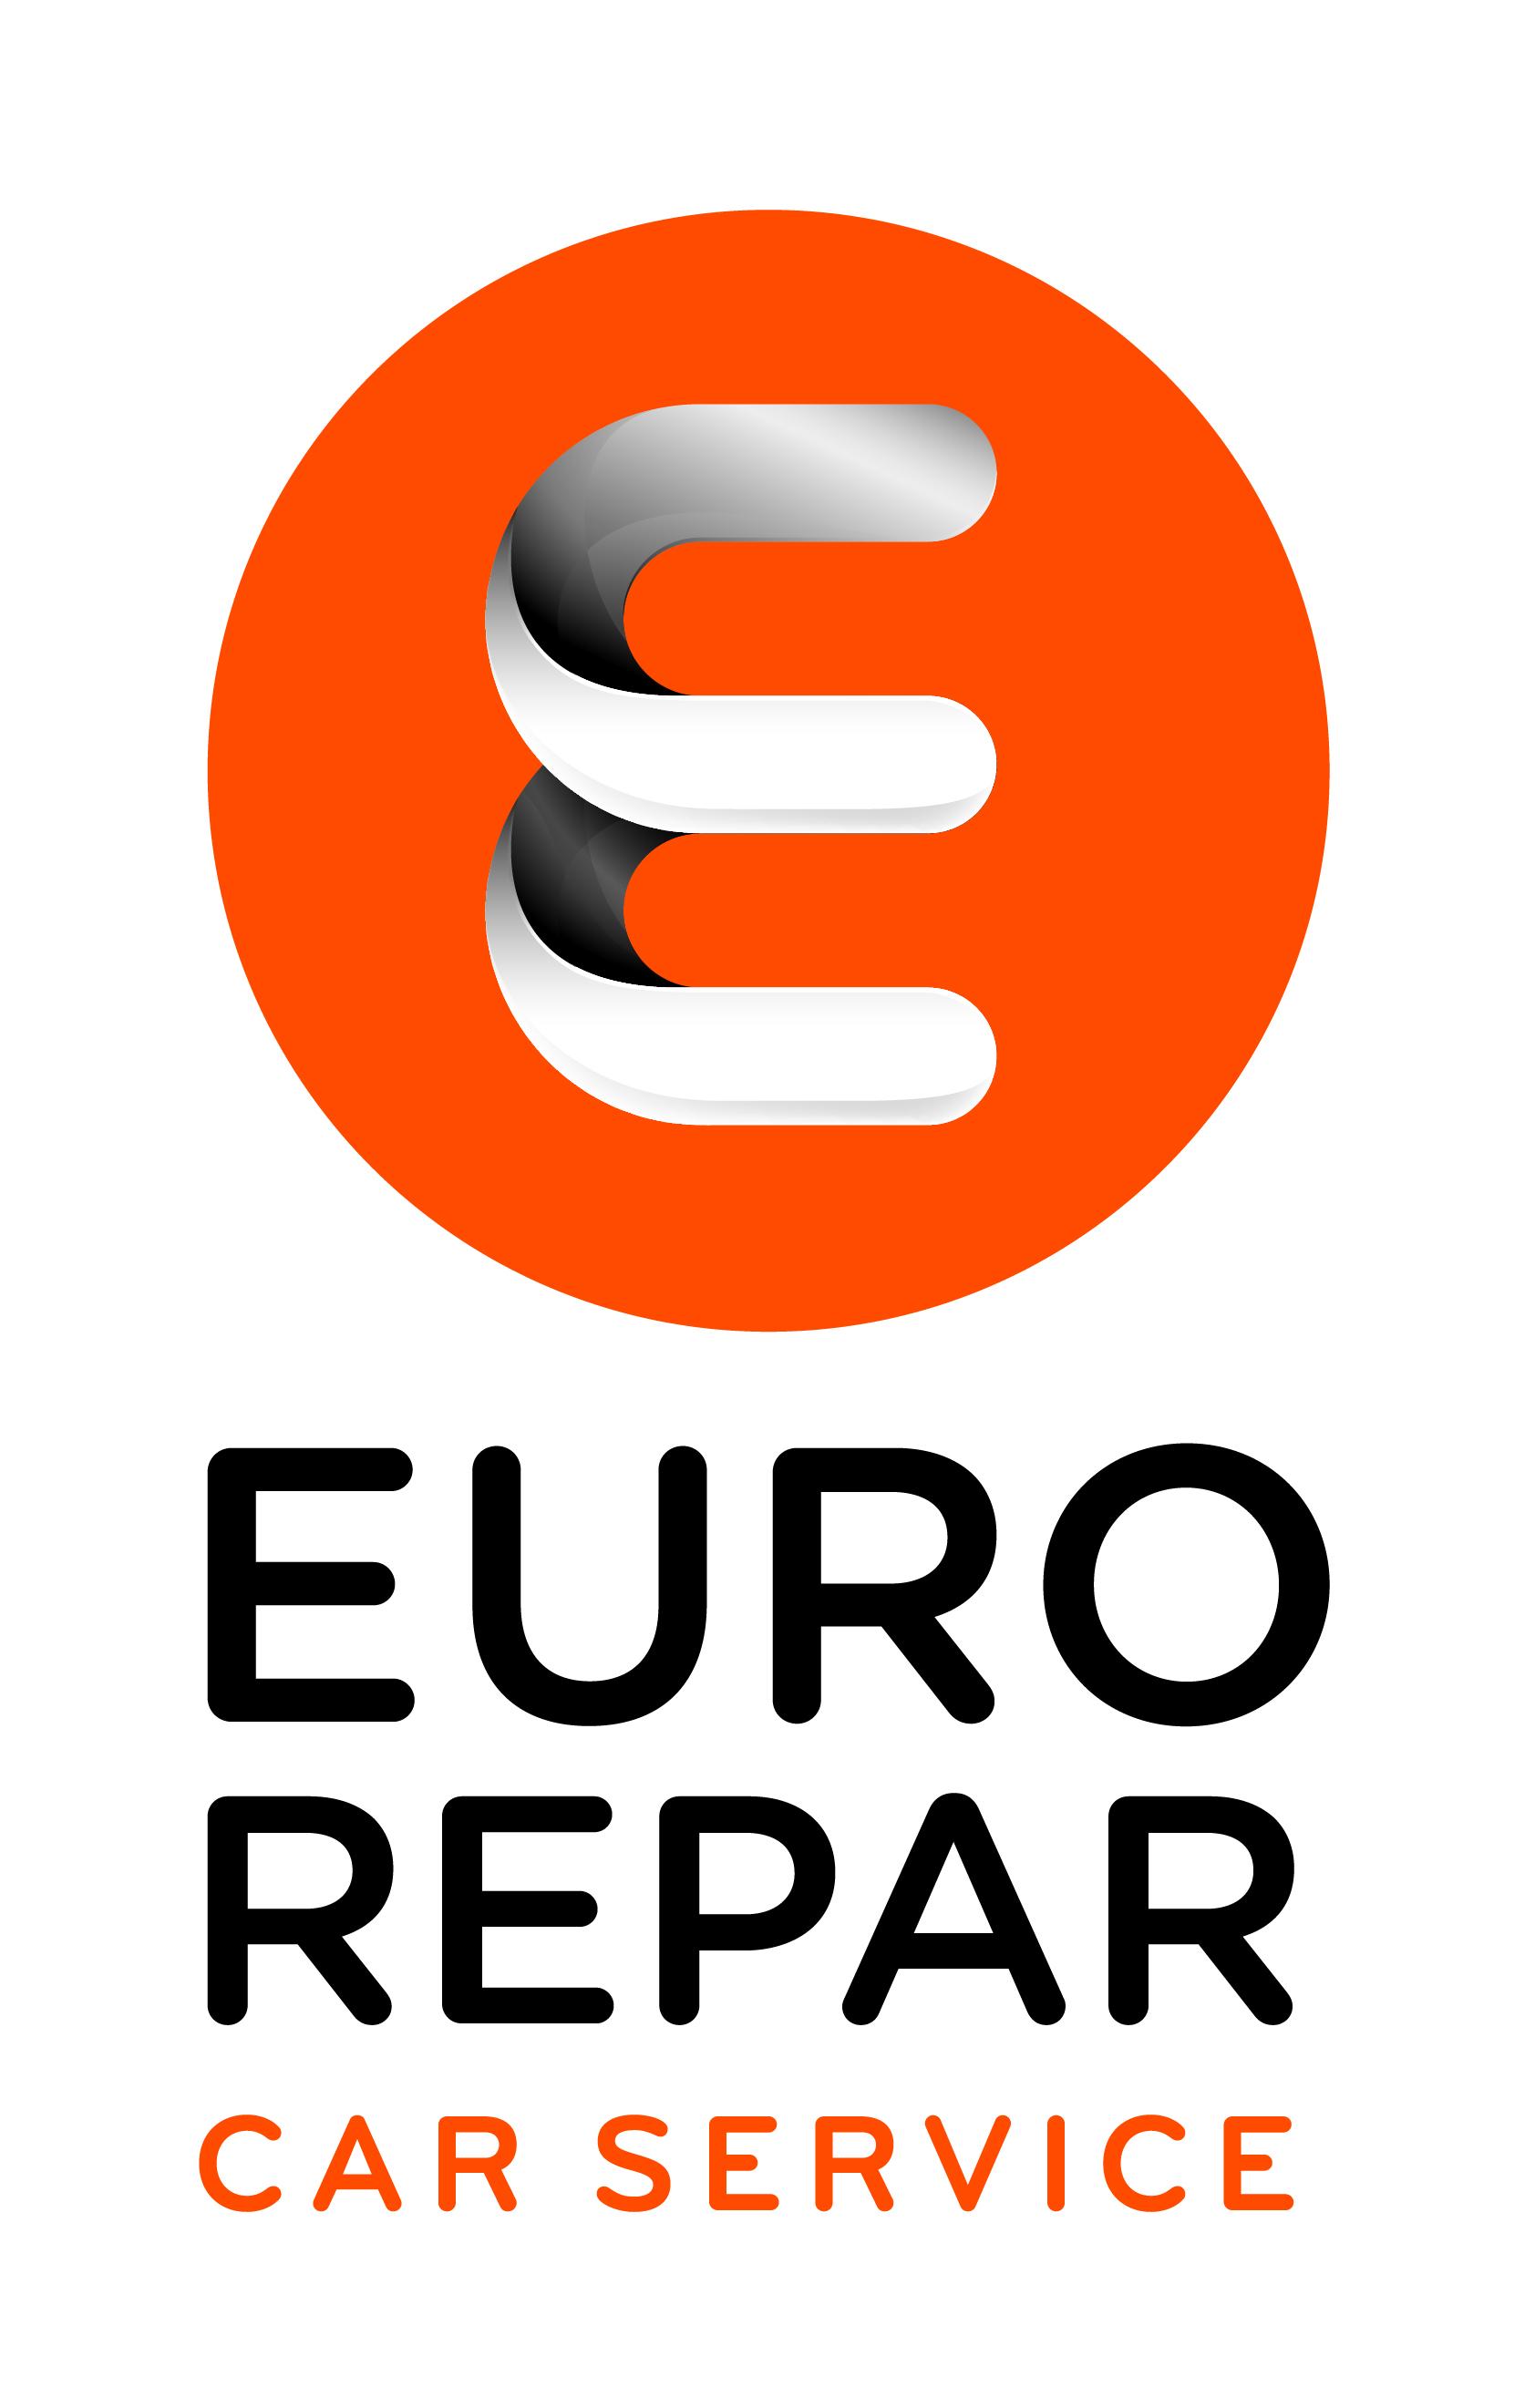 Euro Repar Car Service Leupold logo